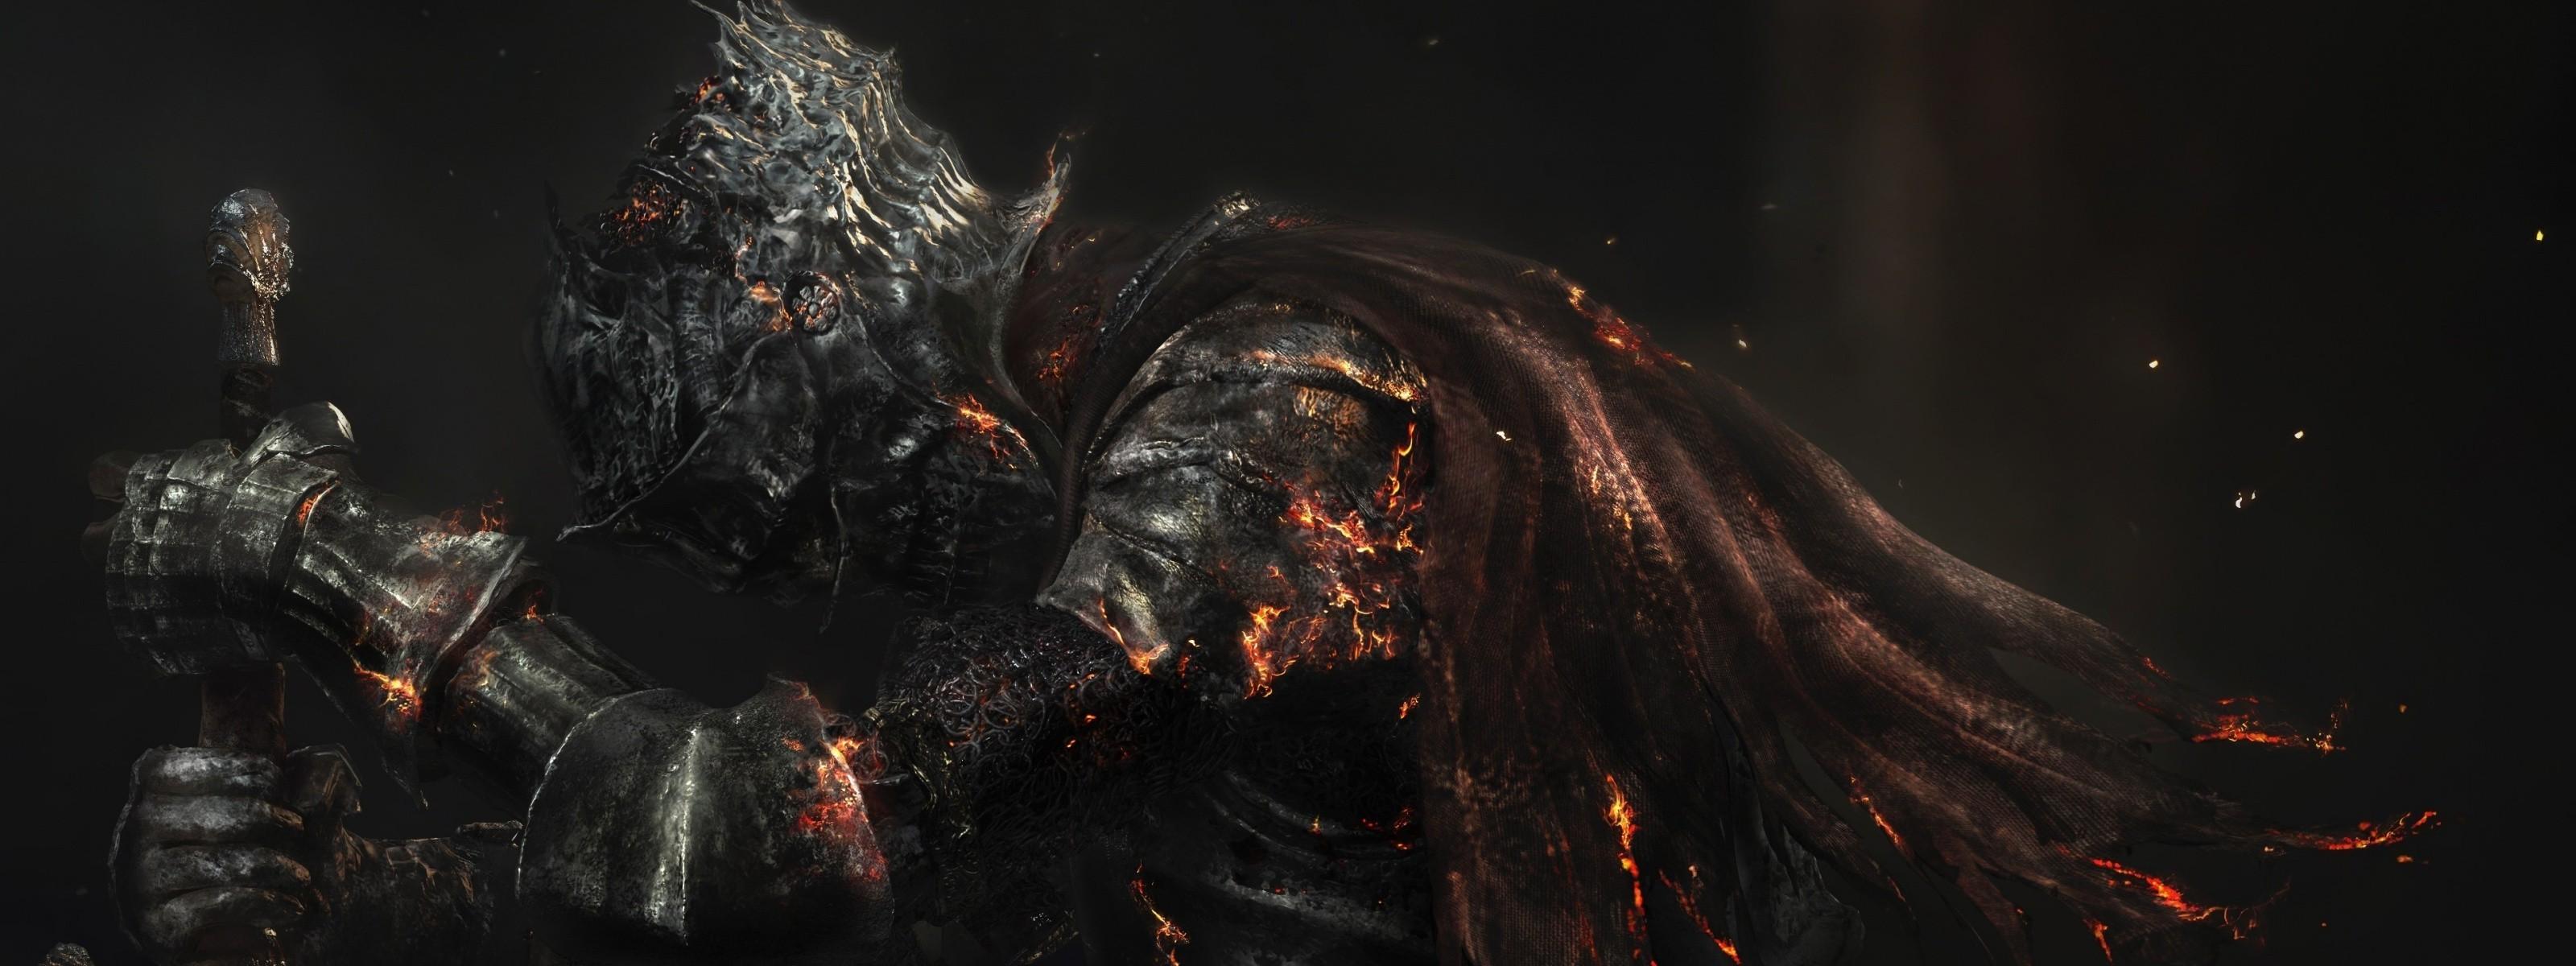 Dark Souls Iii Video Games Artwork Wallpapers Hd